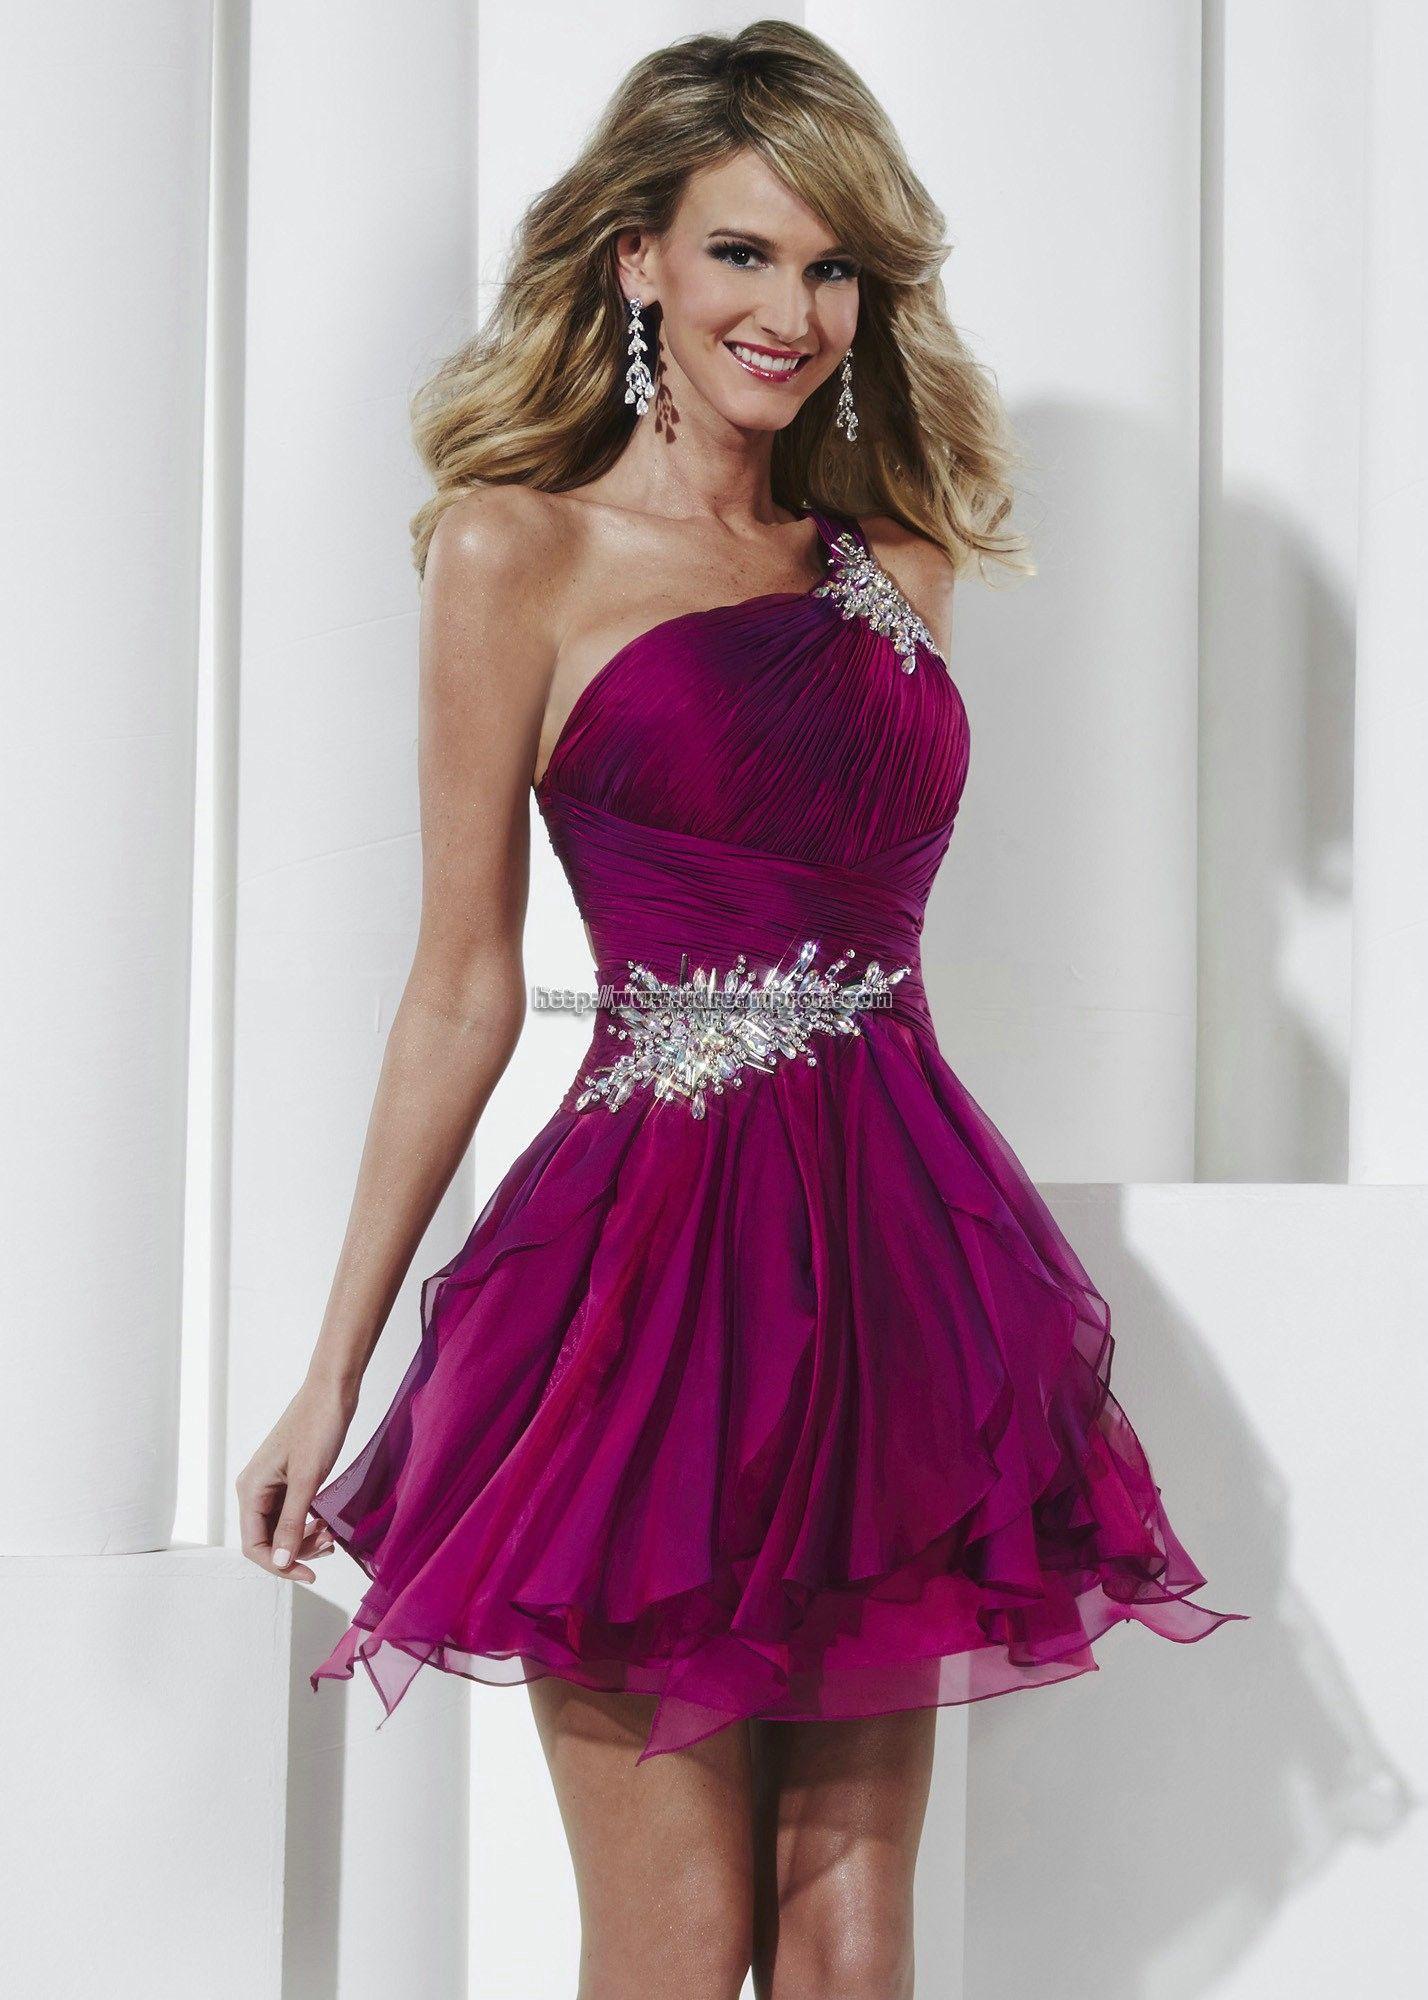 Cocktail Dresses Cocktail Dresses Cocktail Dresses   Homecoming ...